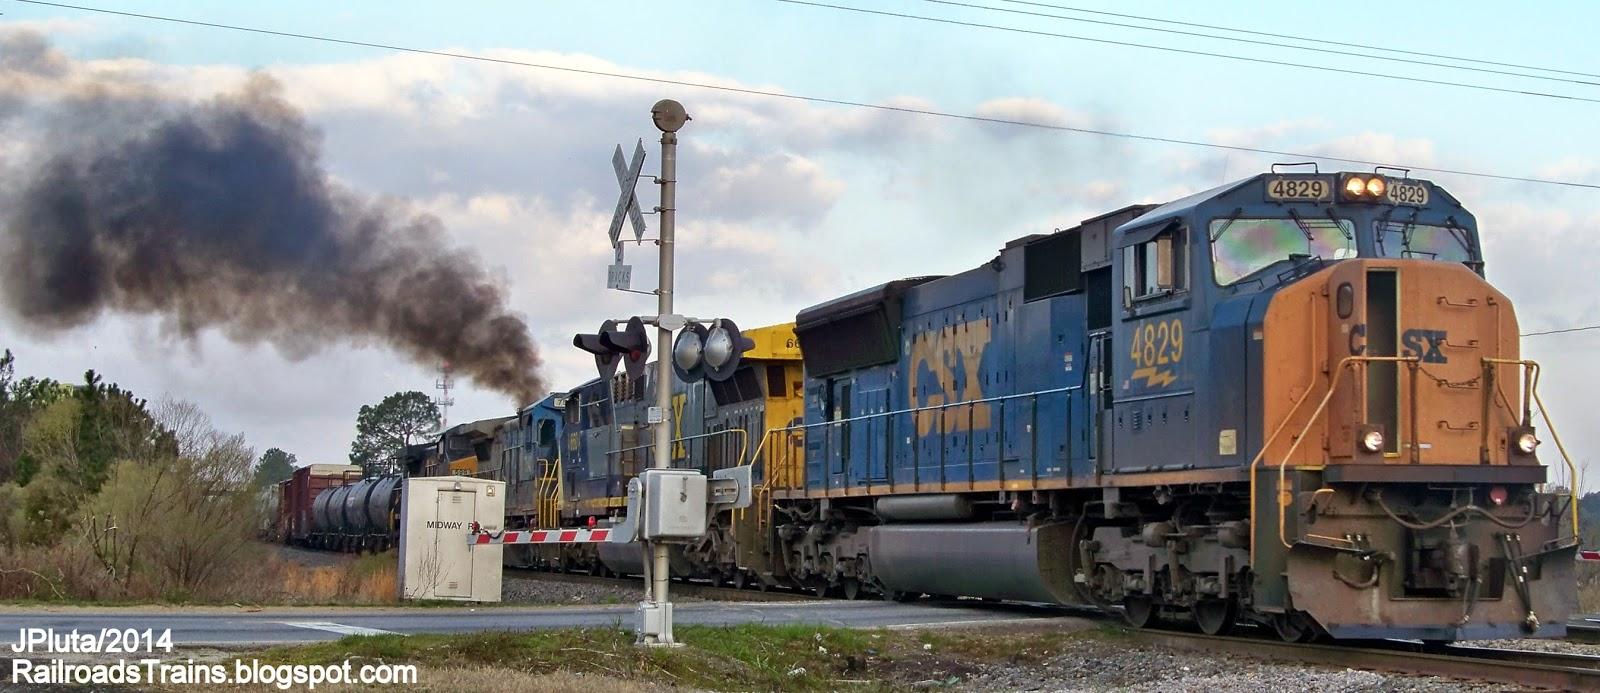 Railroad Freight Train Locomotive Engine Emd Ge Boxcar